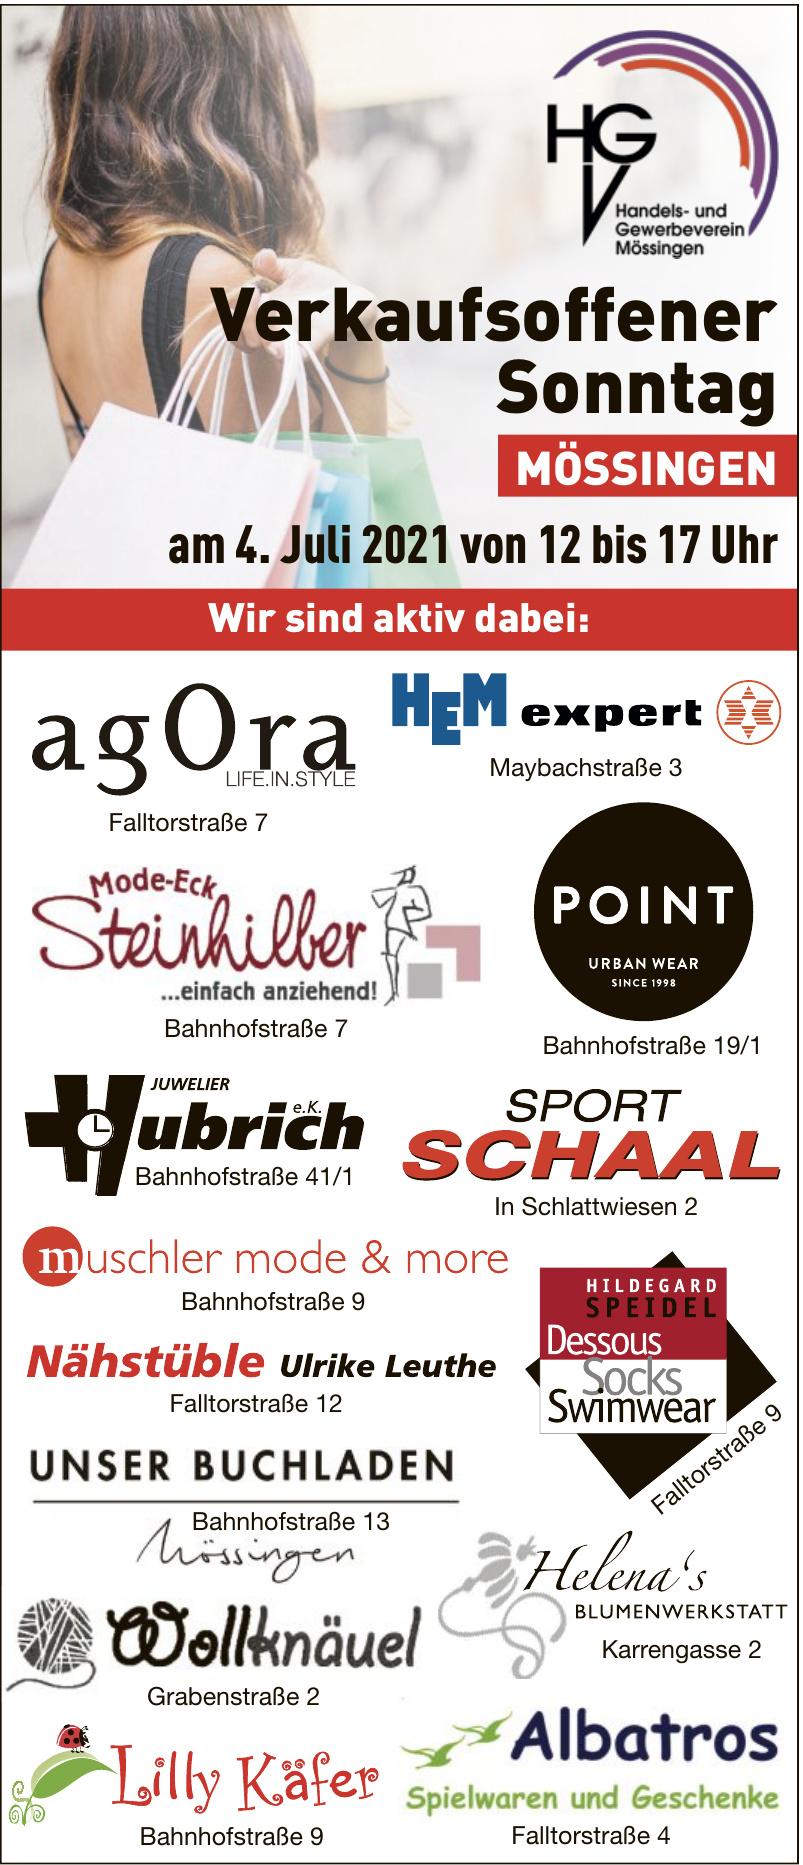 Verkaufsoffener Sonntag Mössingen